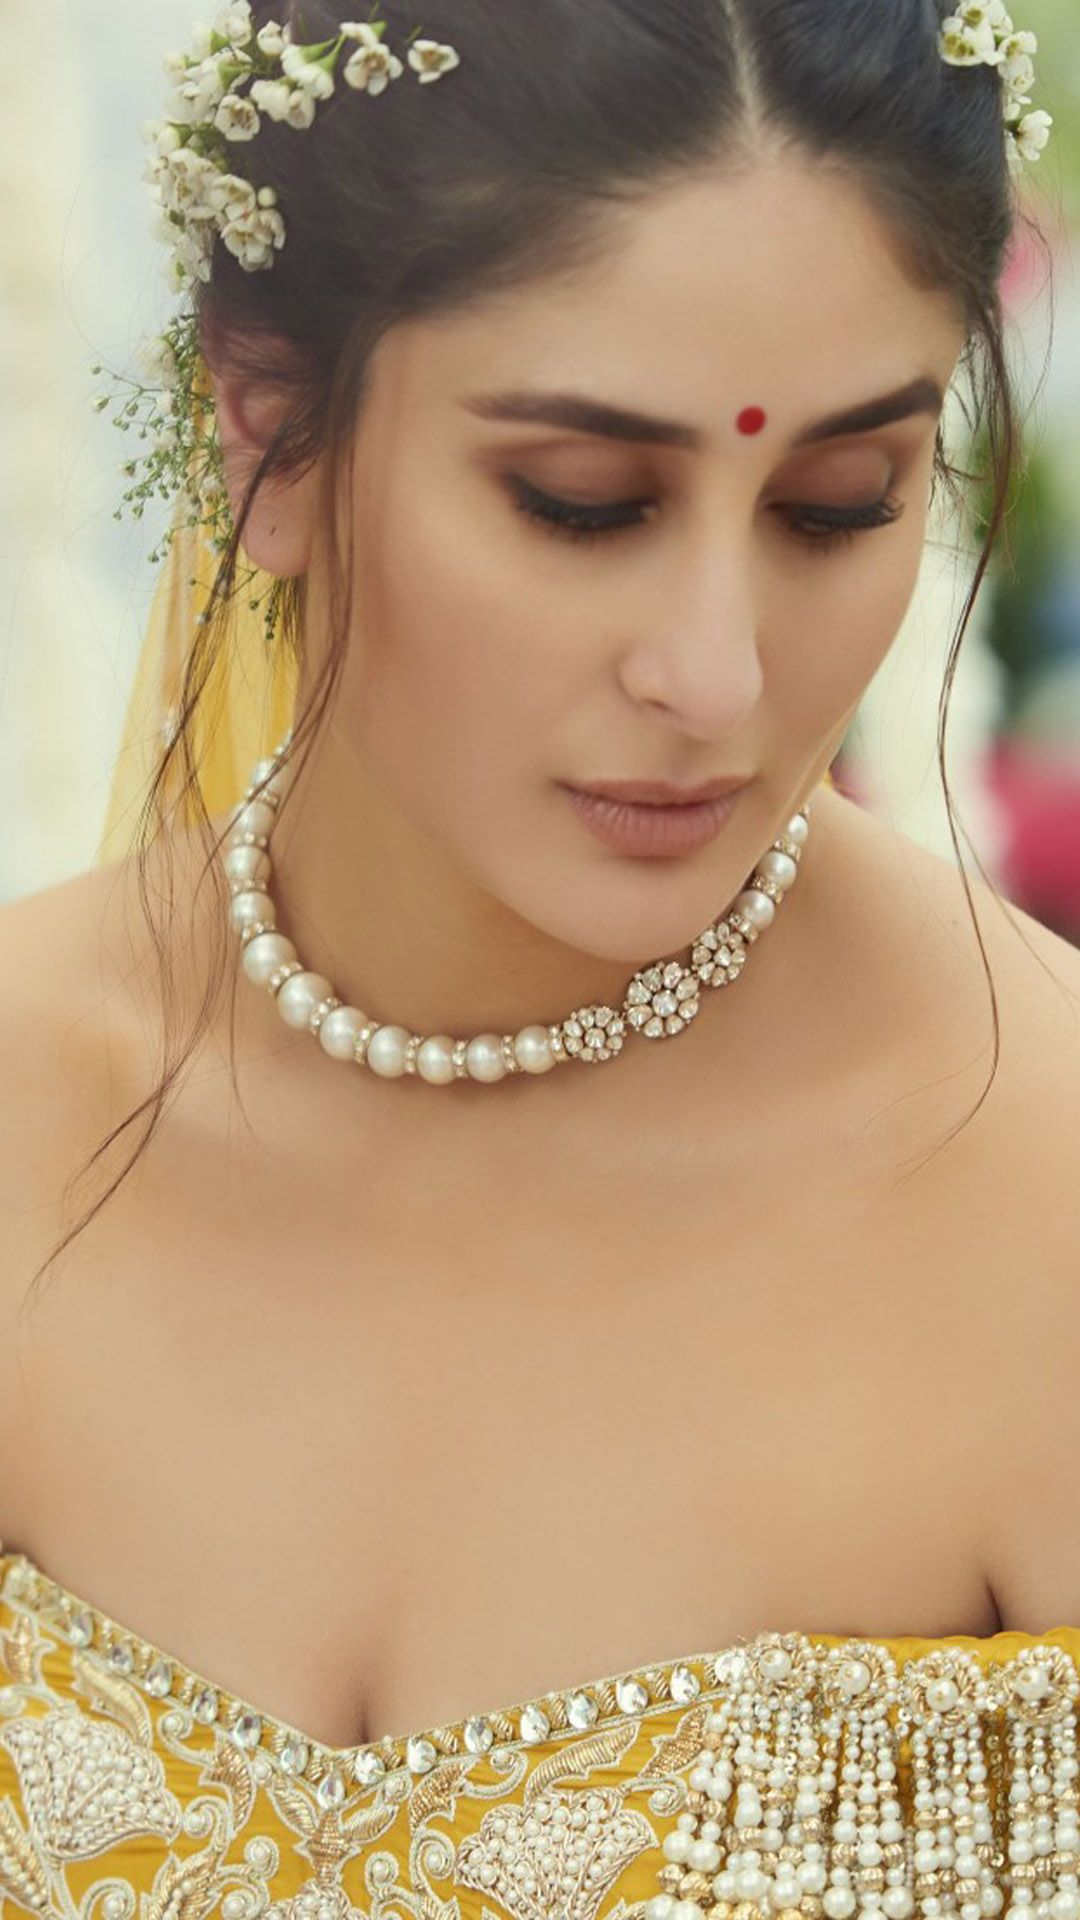 Kareena Kapoor In Bridal Wedding Outfit 4k Ultra Hd Mobile Wallpaper Kareena Kapoor Wedding Kareena Kapoor Kareena Kapoor Wallpapers